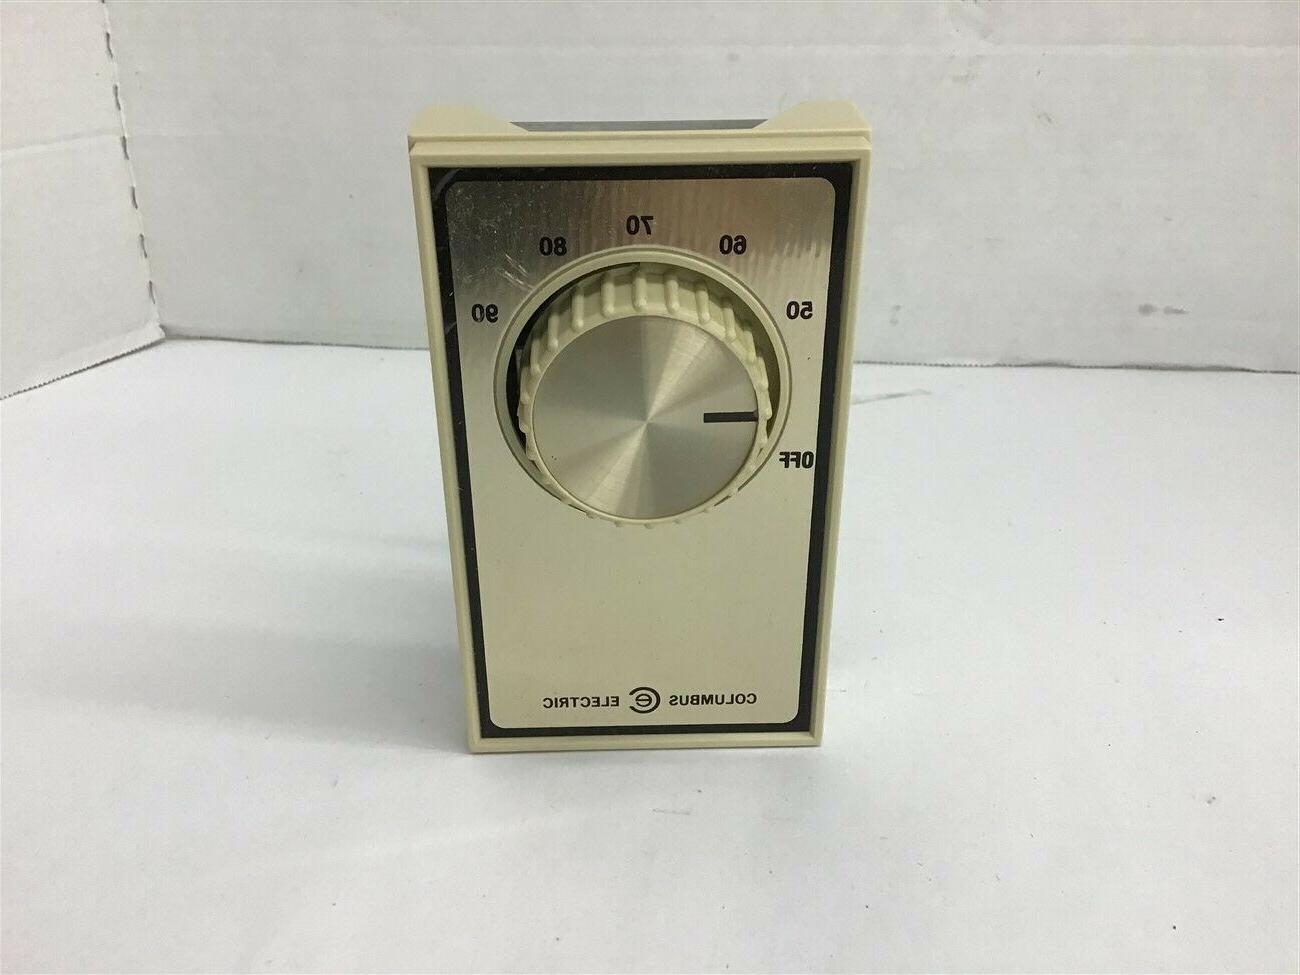 Columbus AET5DW1 Heating Thermostat 50-90 Degree